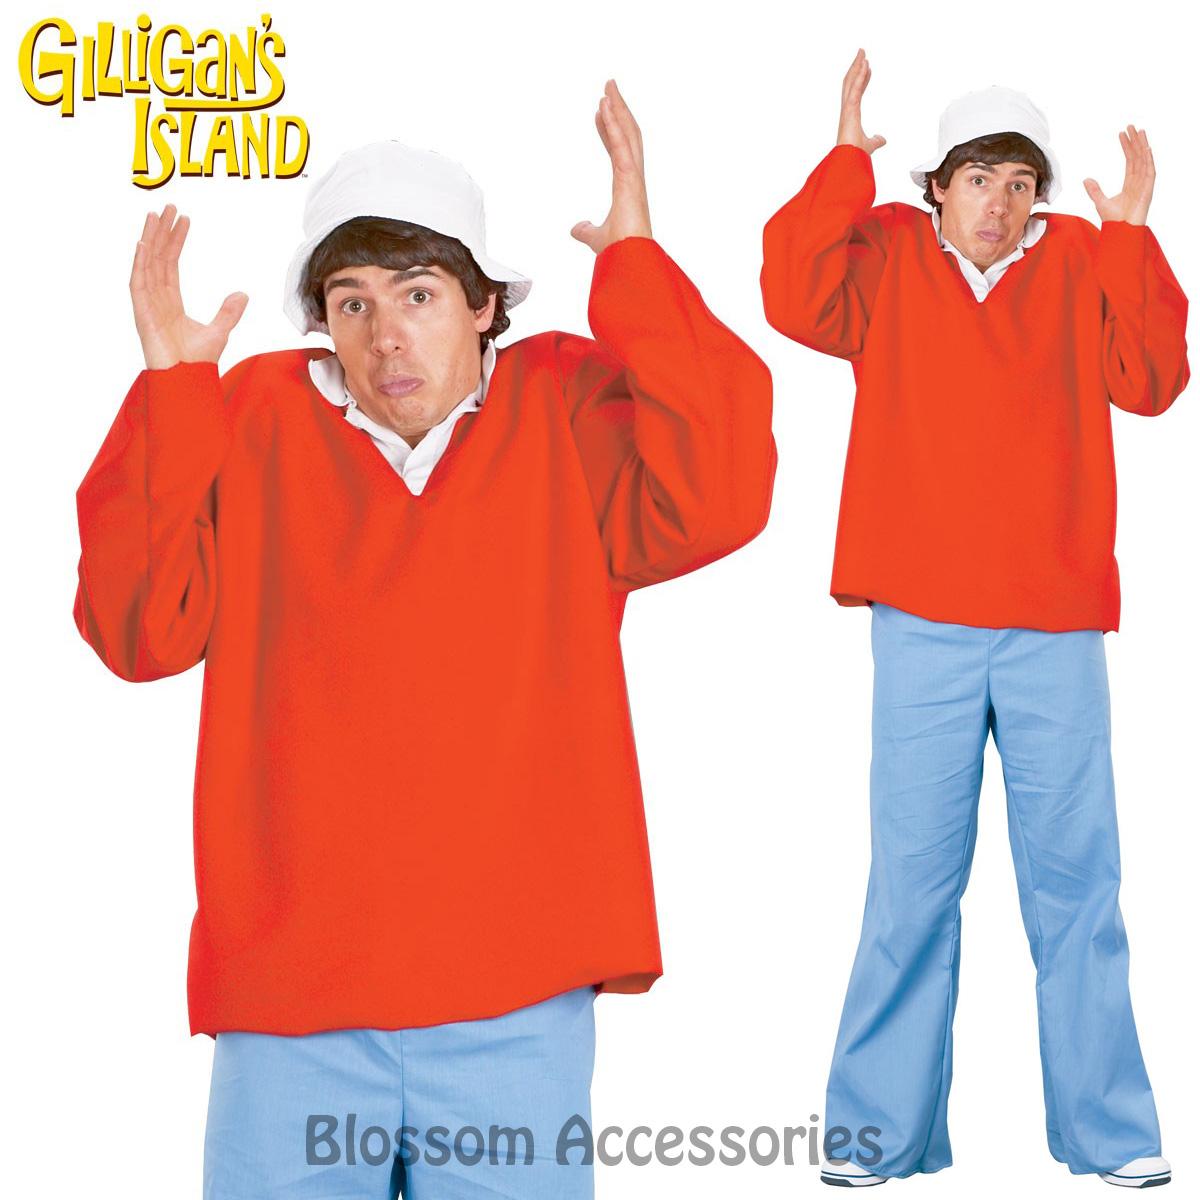 cl792 gilligan's island gilligan tv show fancy dress mens halloween